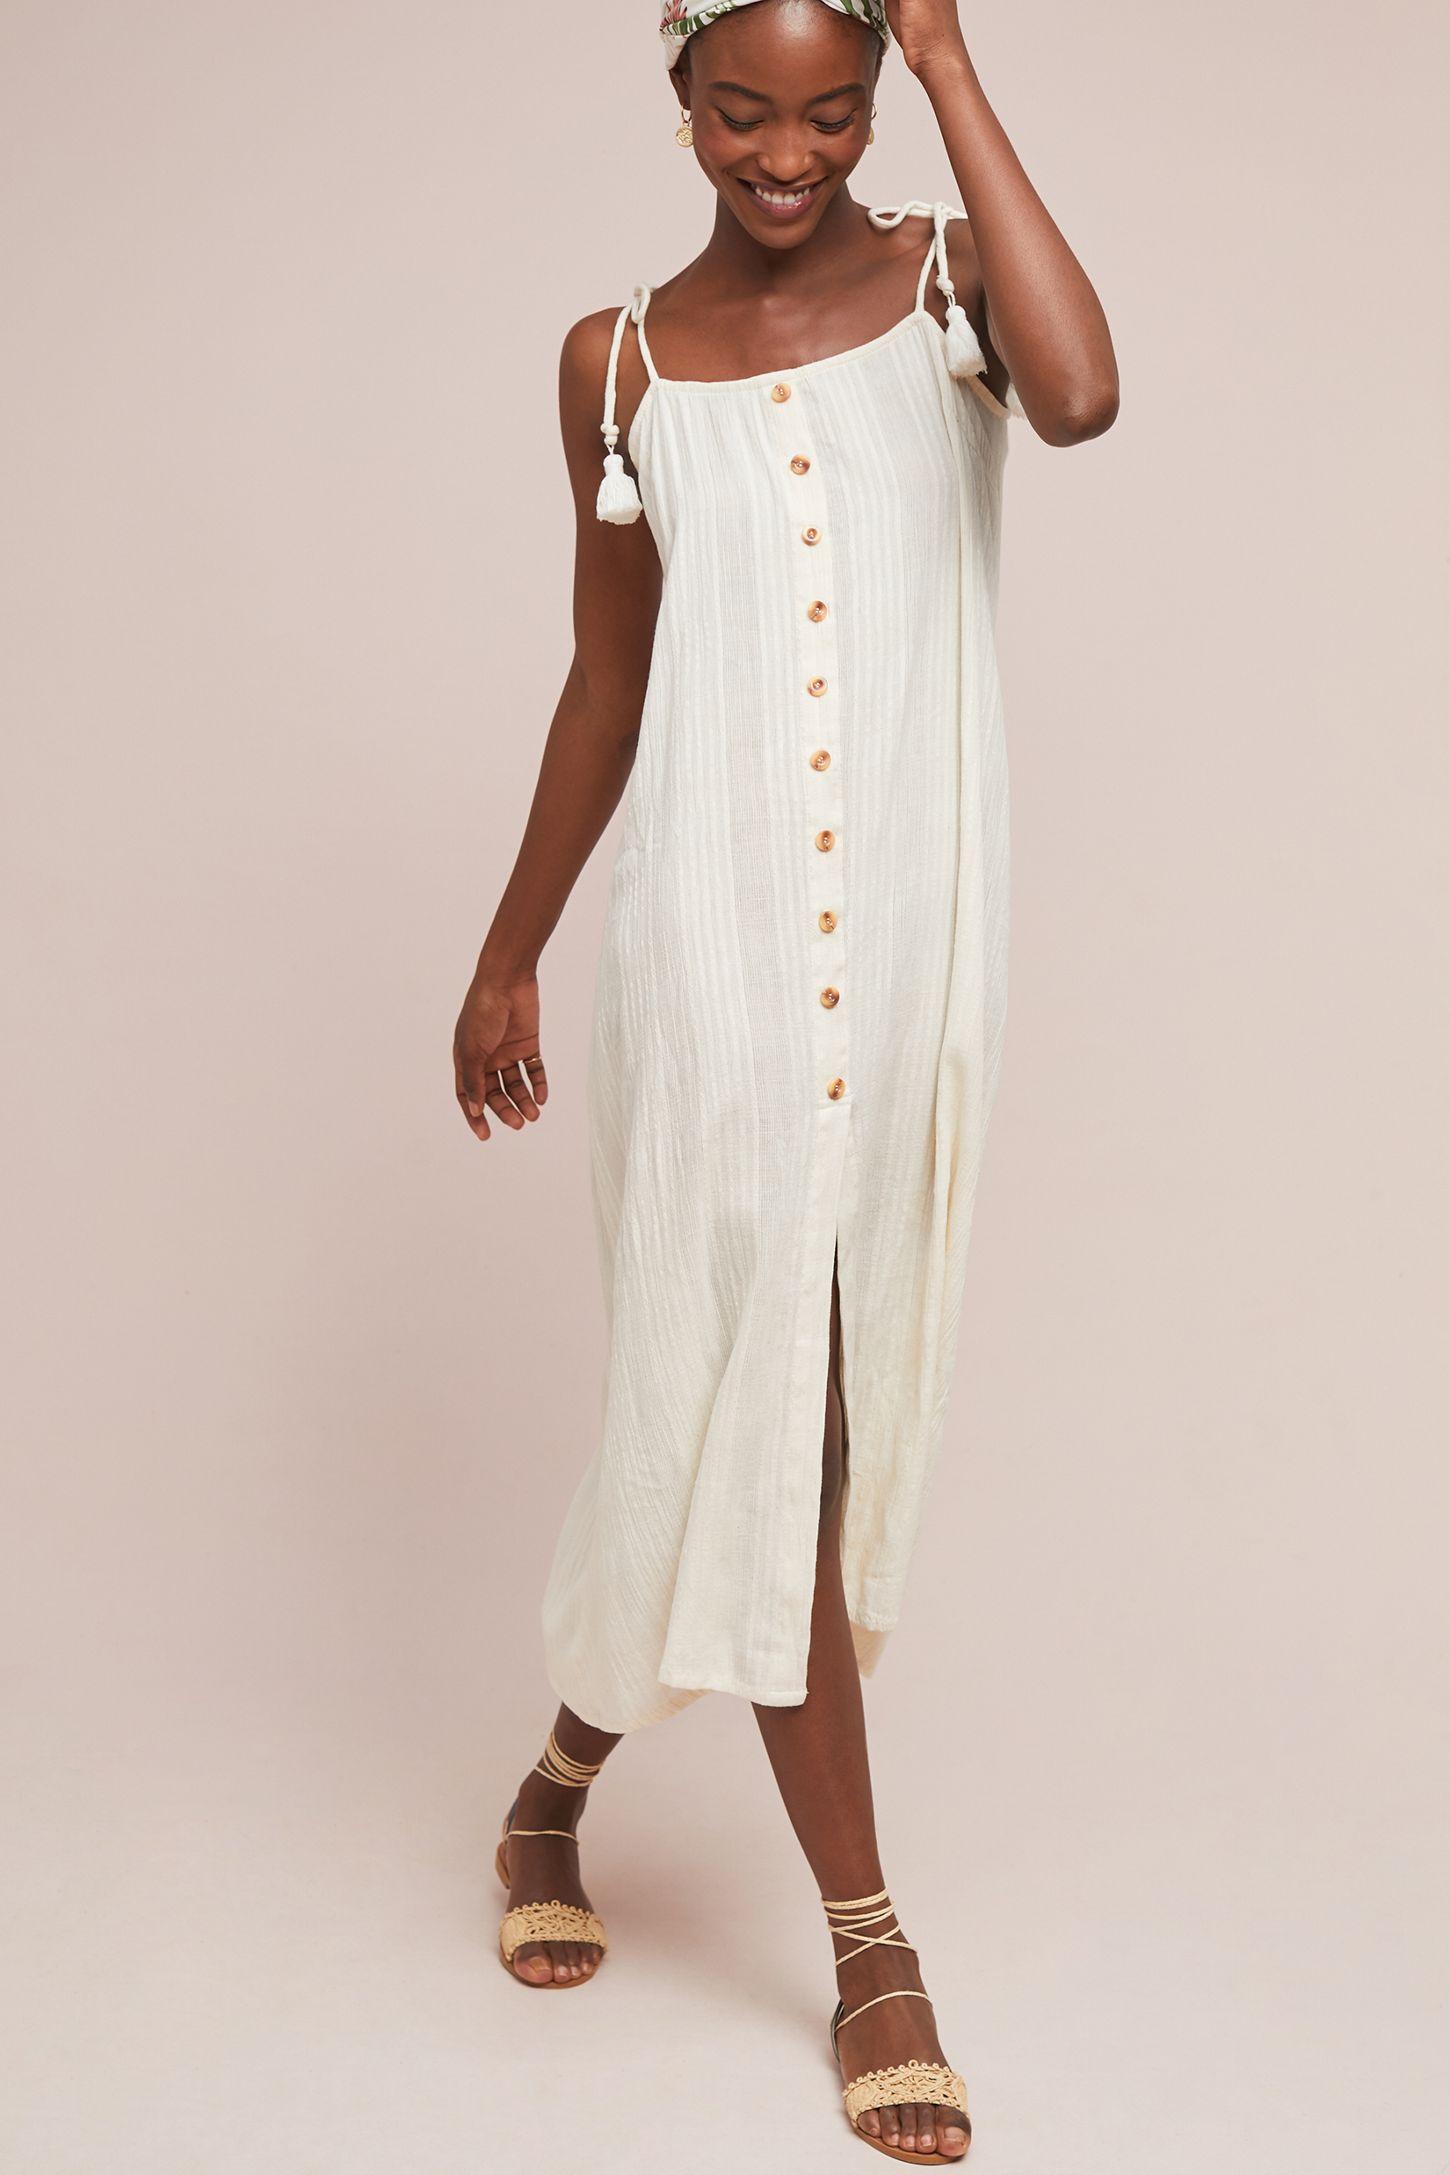 c81f794b32 Faithfull Luna Midi Dress